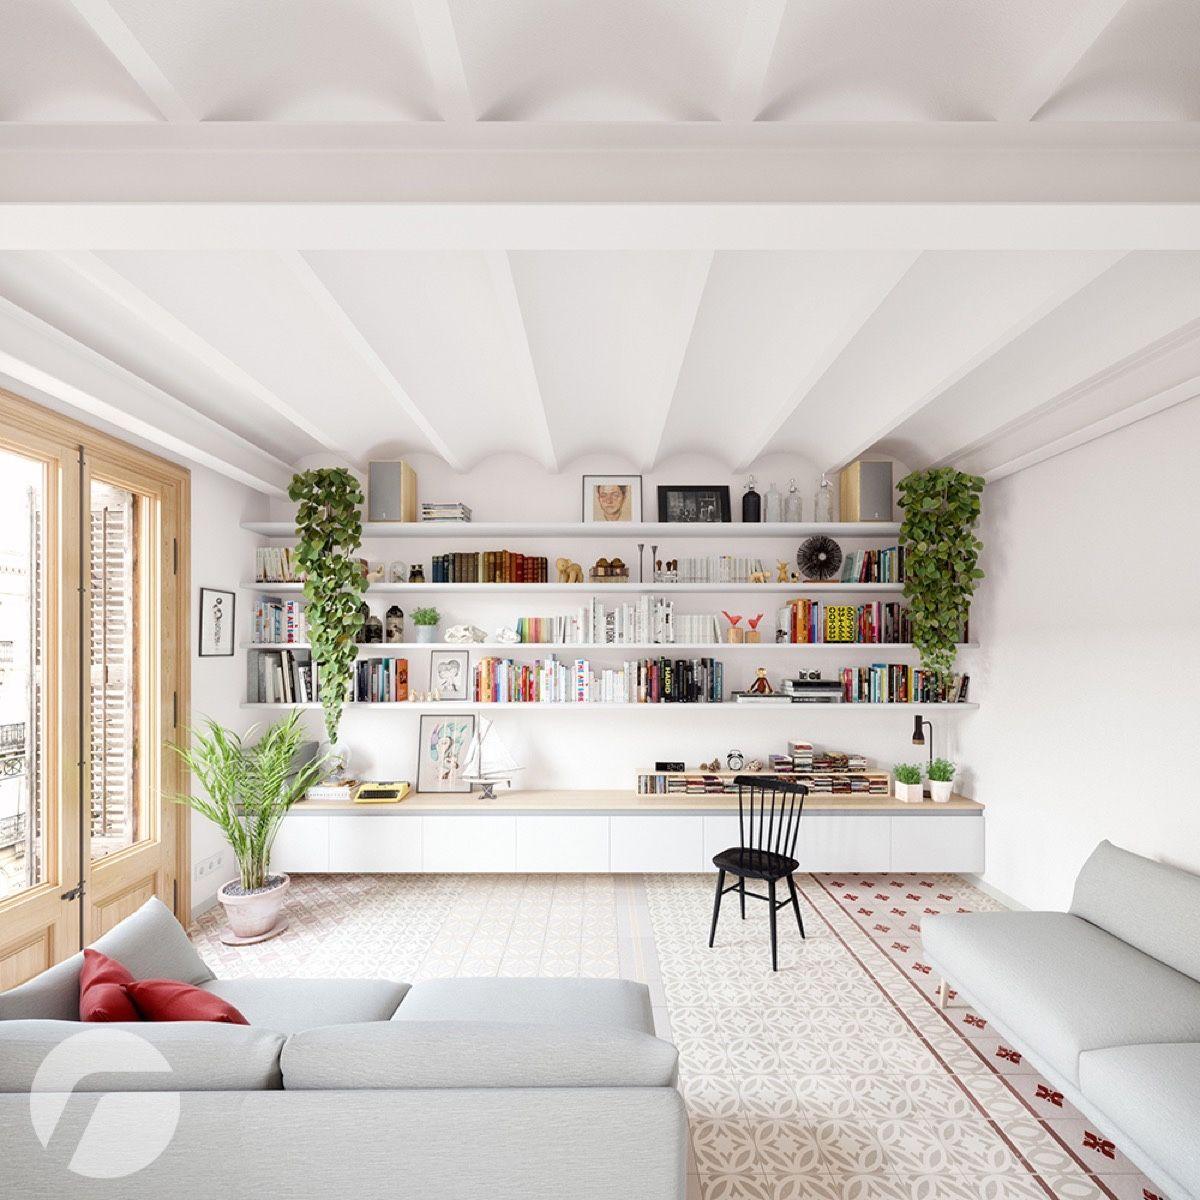 7 Gorgeous Modern Scandinavian Interior Design Ideas | Flourish ...